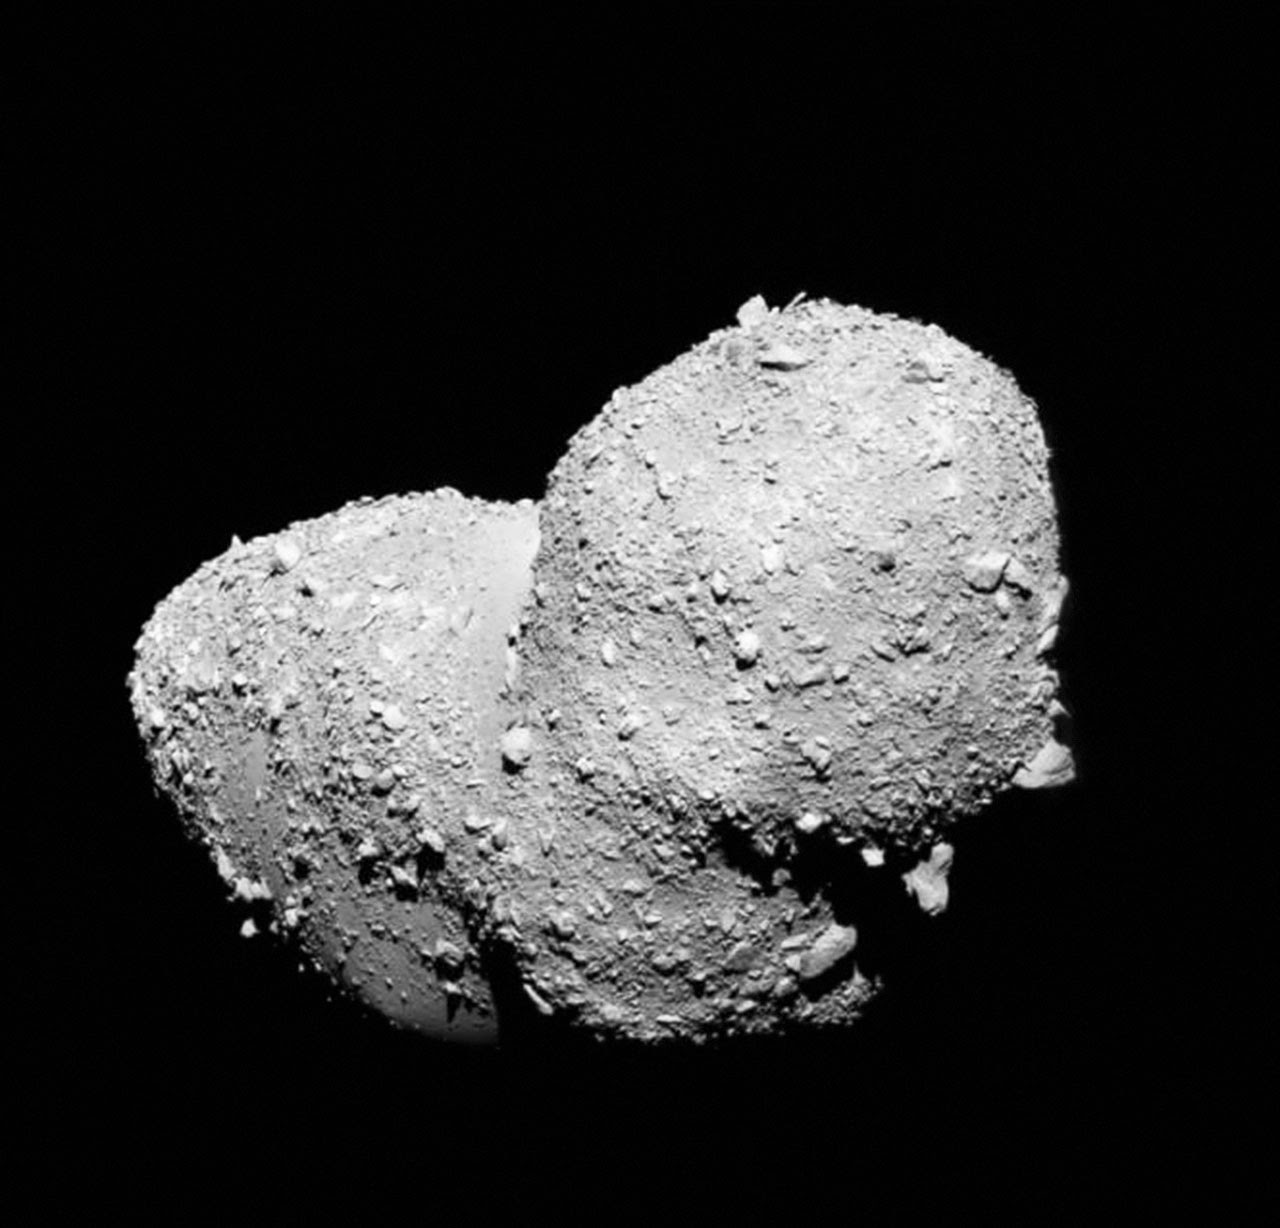 itokawa asteroid surface - photo #23